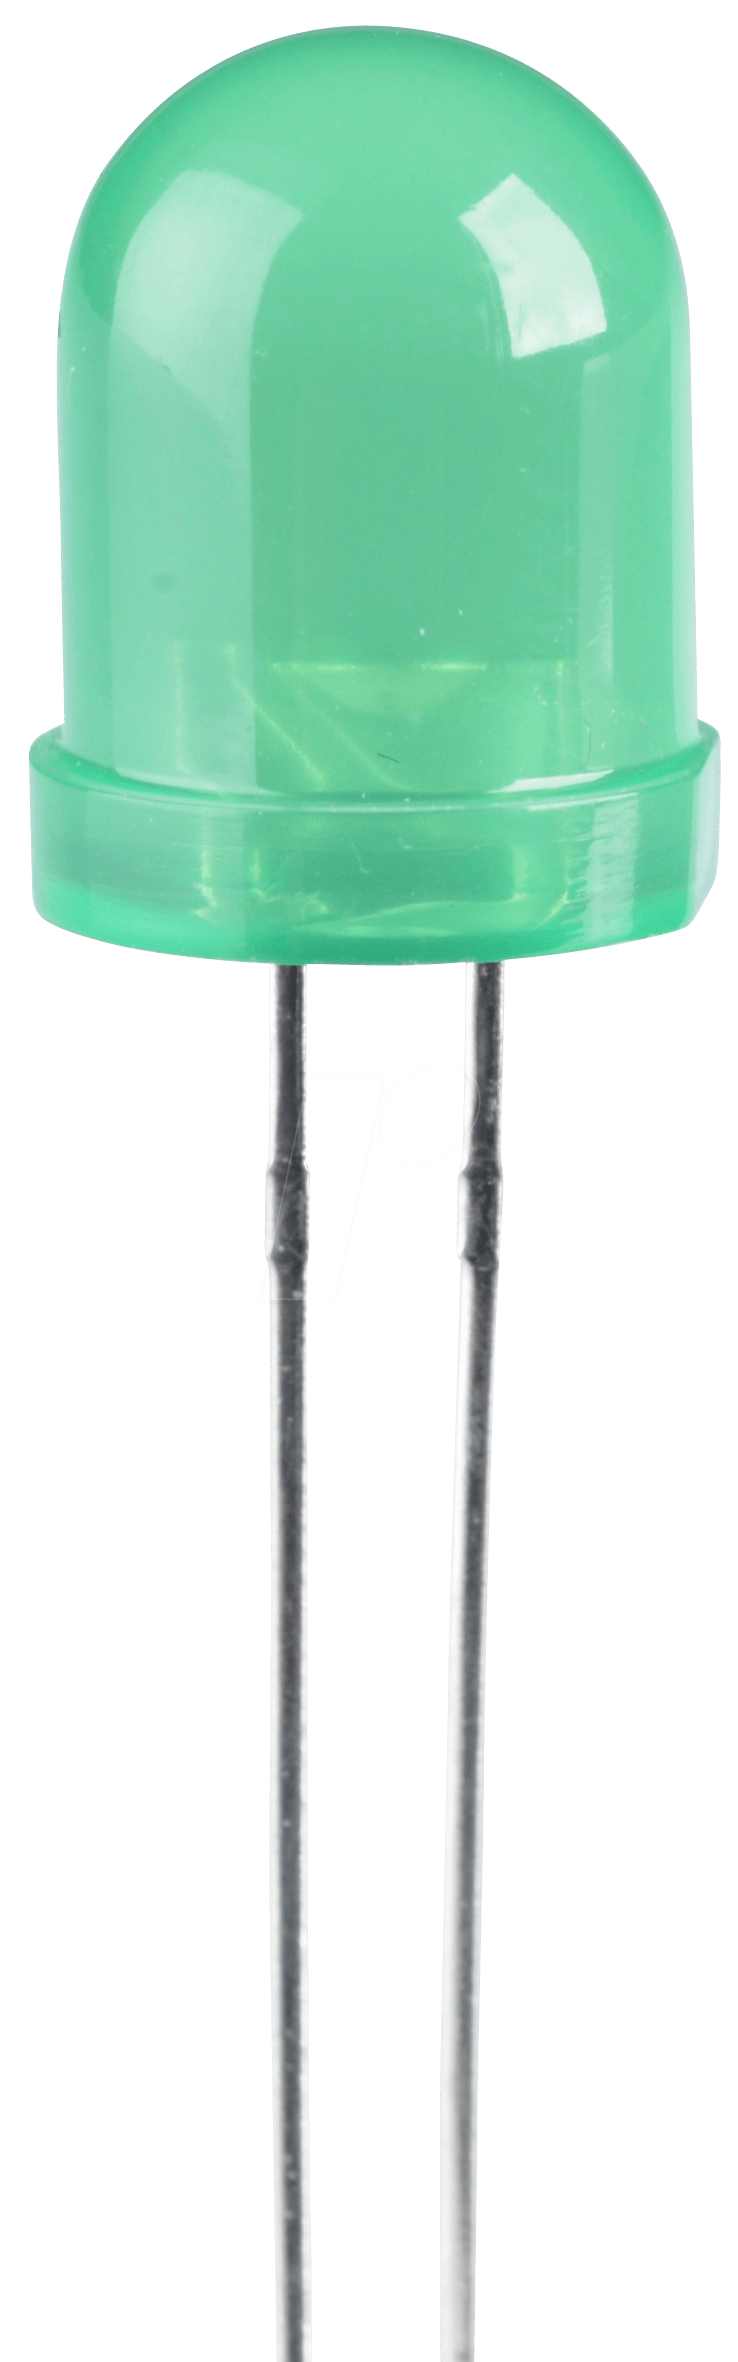 LED 8MM GN - LED, 8 mm, bedrahtet, grün, 70 mcd, 50°